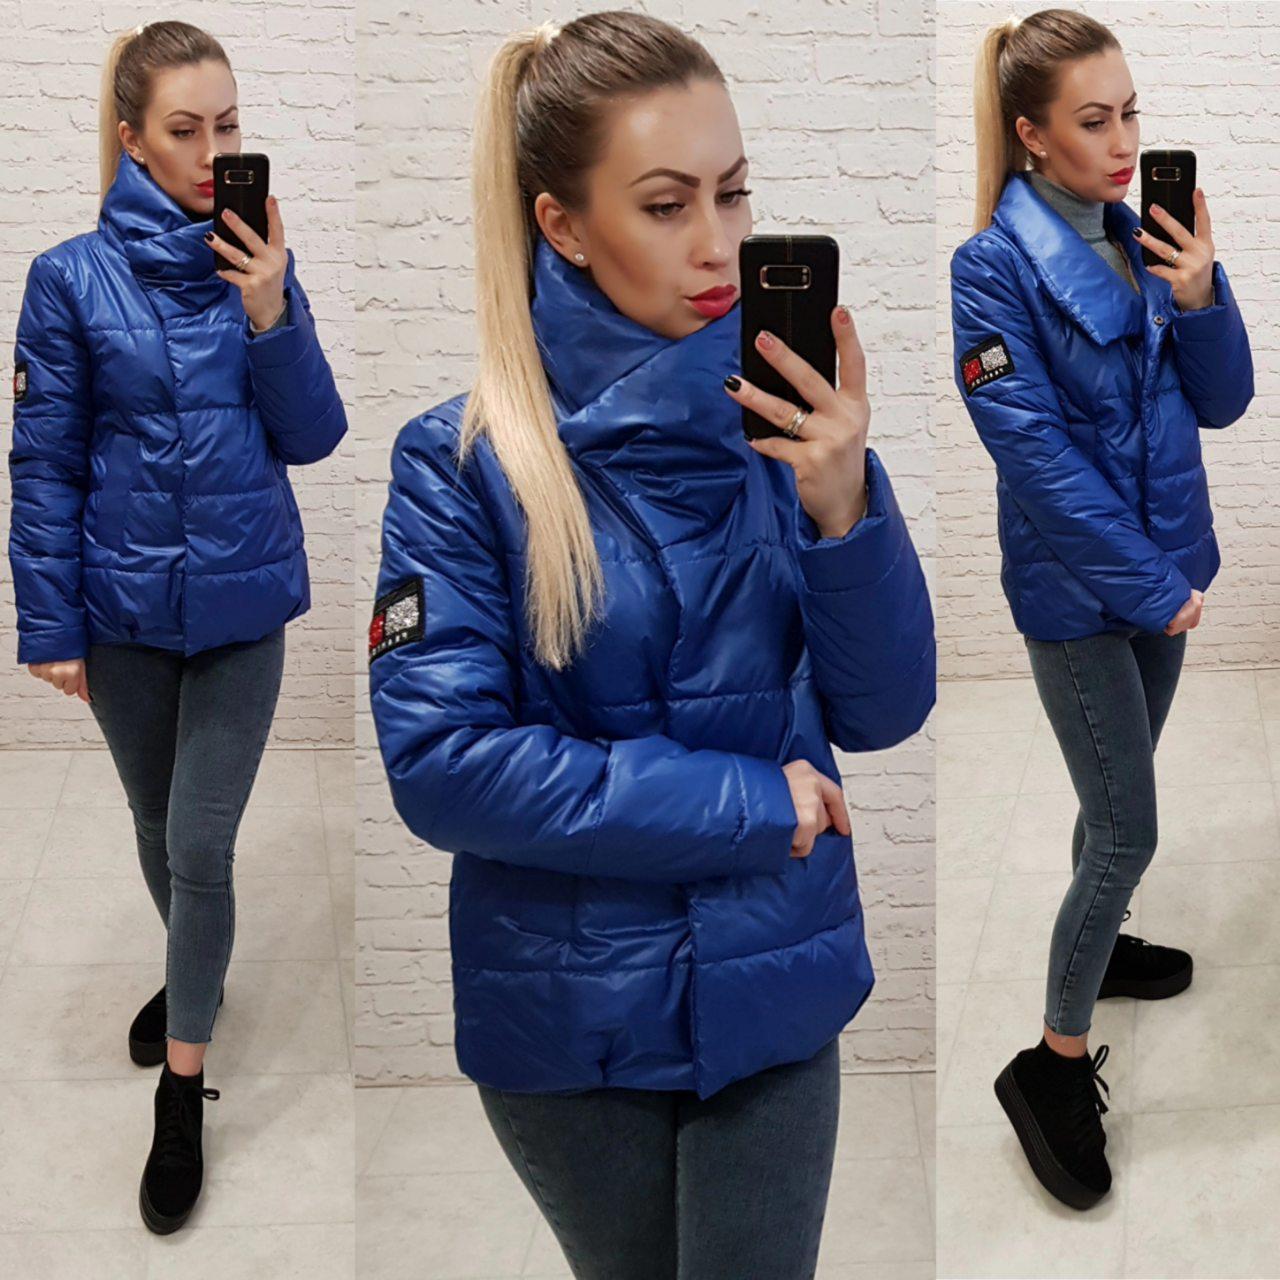 Демисезонная куртка 2019 ,арт. 1004, цвет электрик